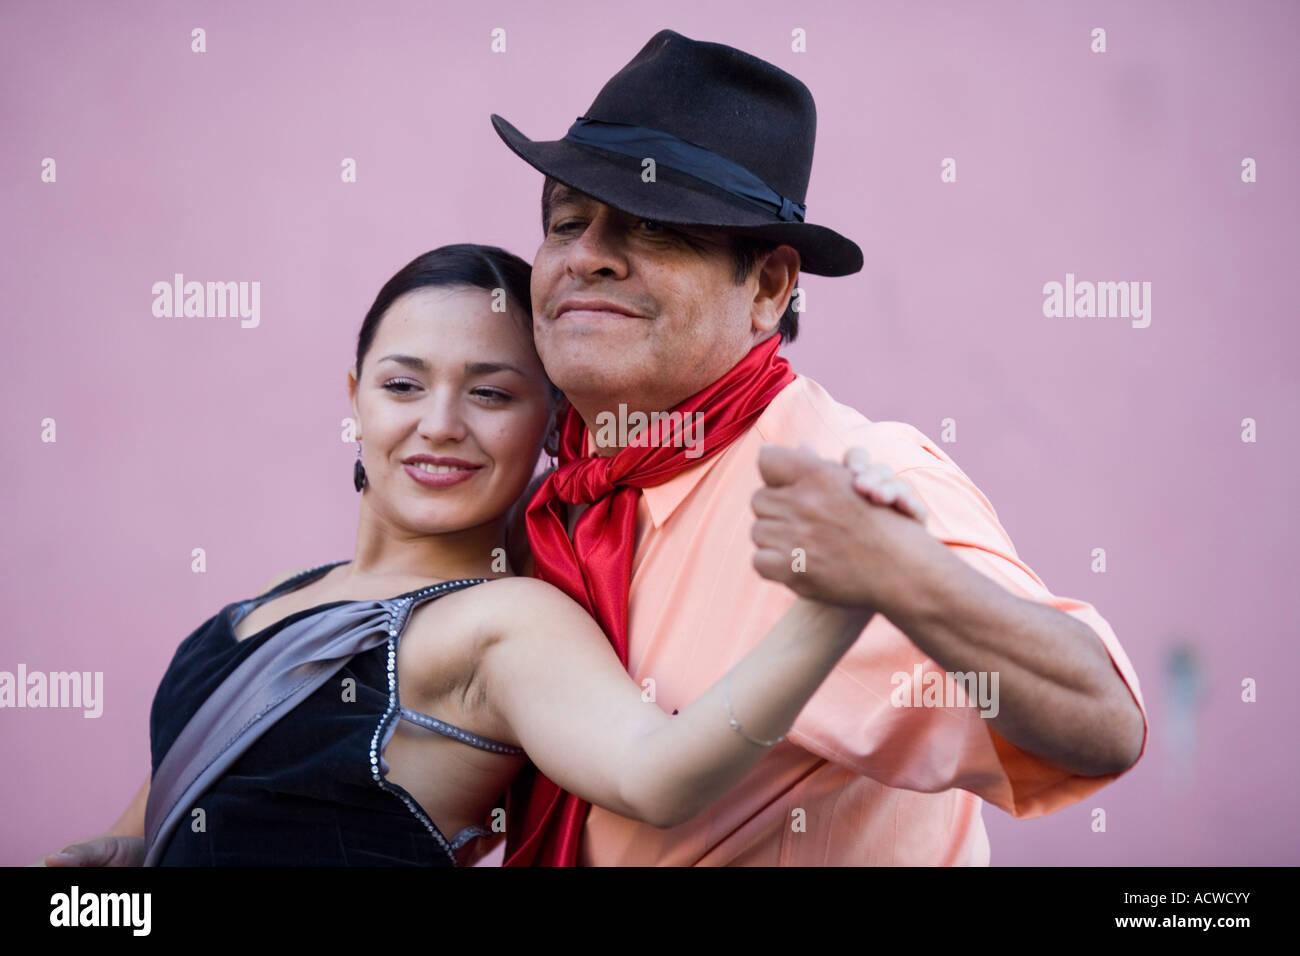 Tango giovane ballerini Buenos Aires Argentina Immagini Stock